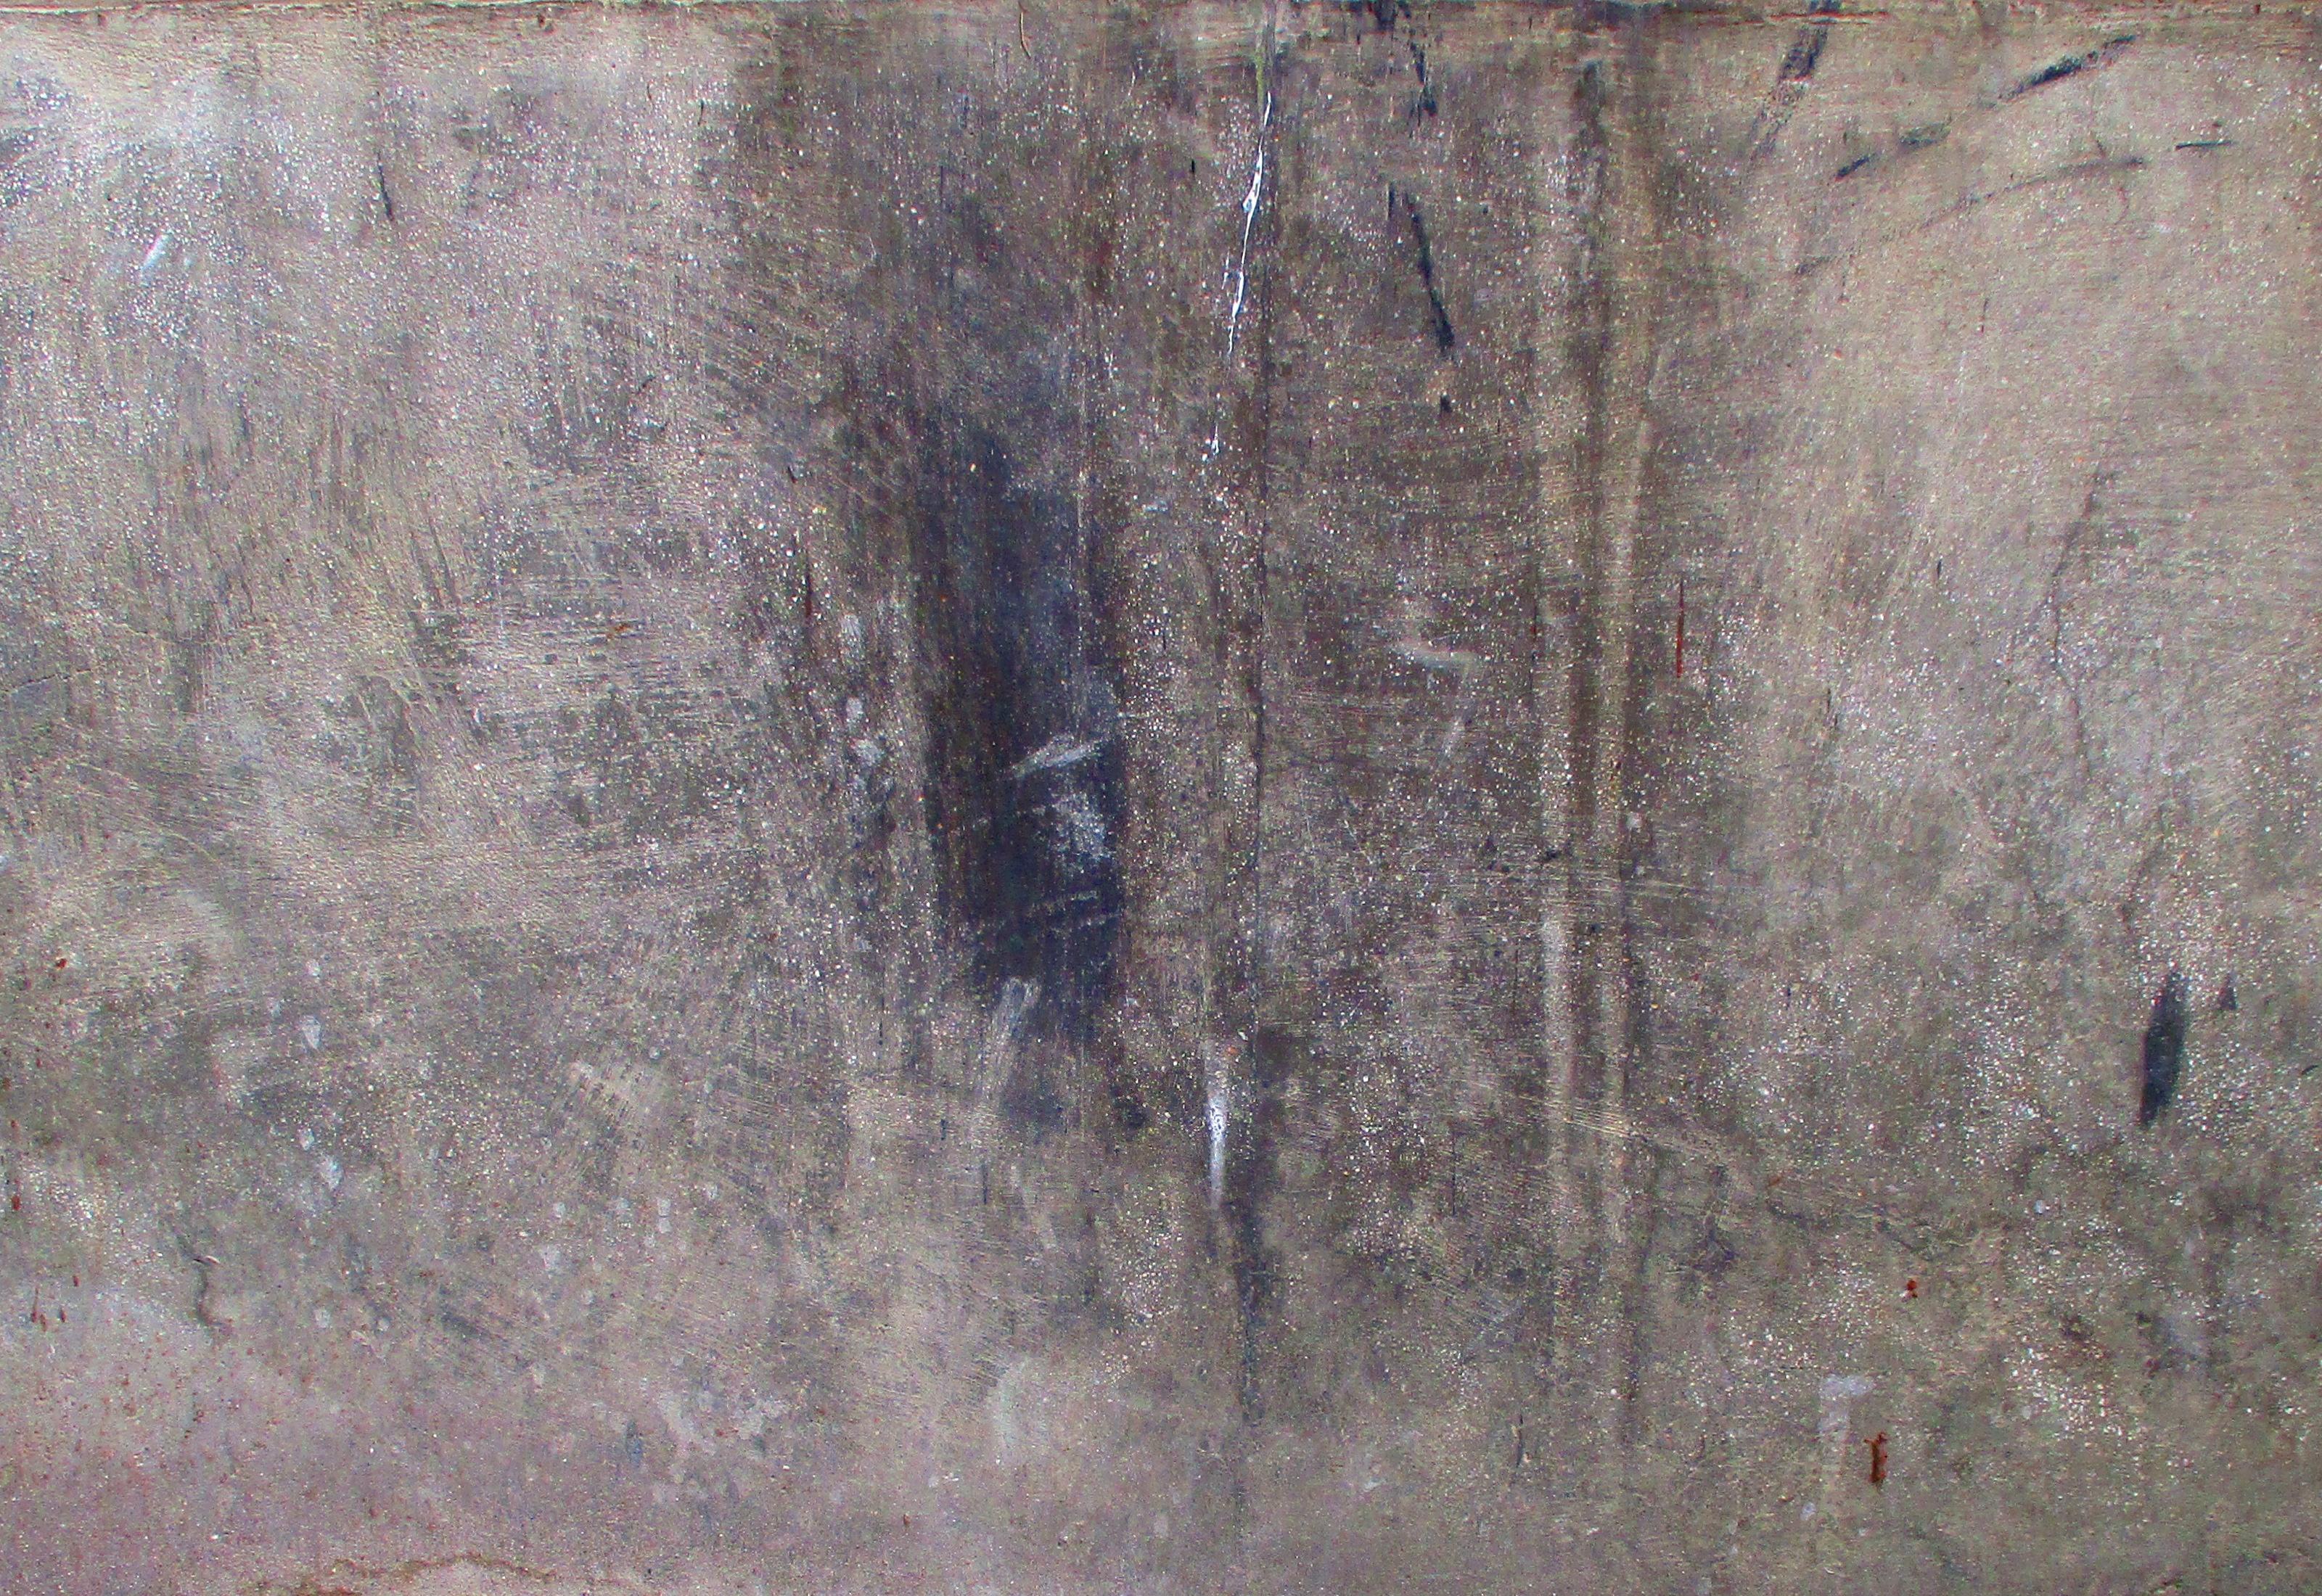 Dirty Concrete Wall Texture (JPG) | OnlyGFX.com